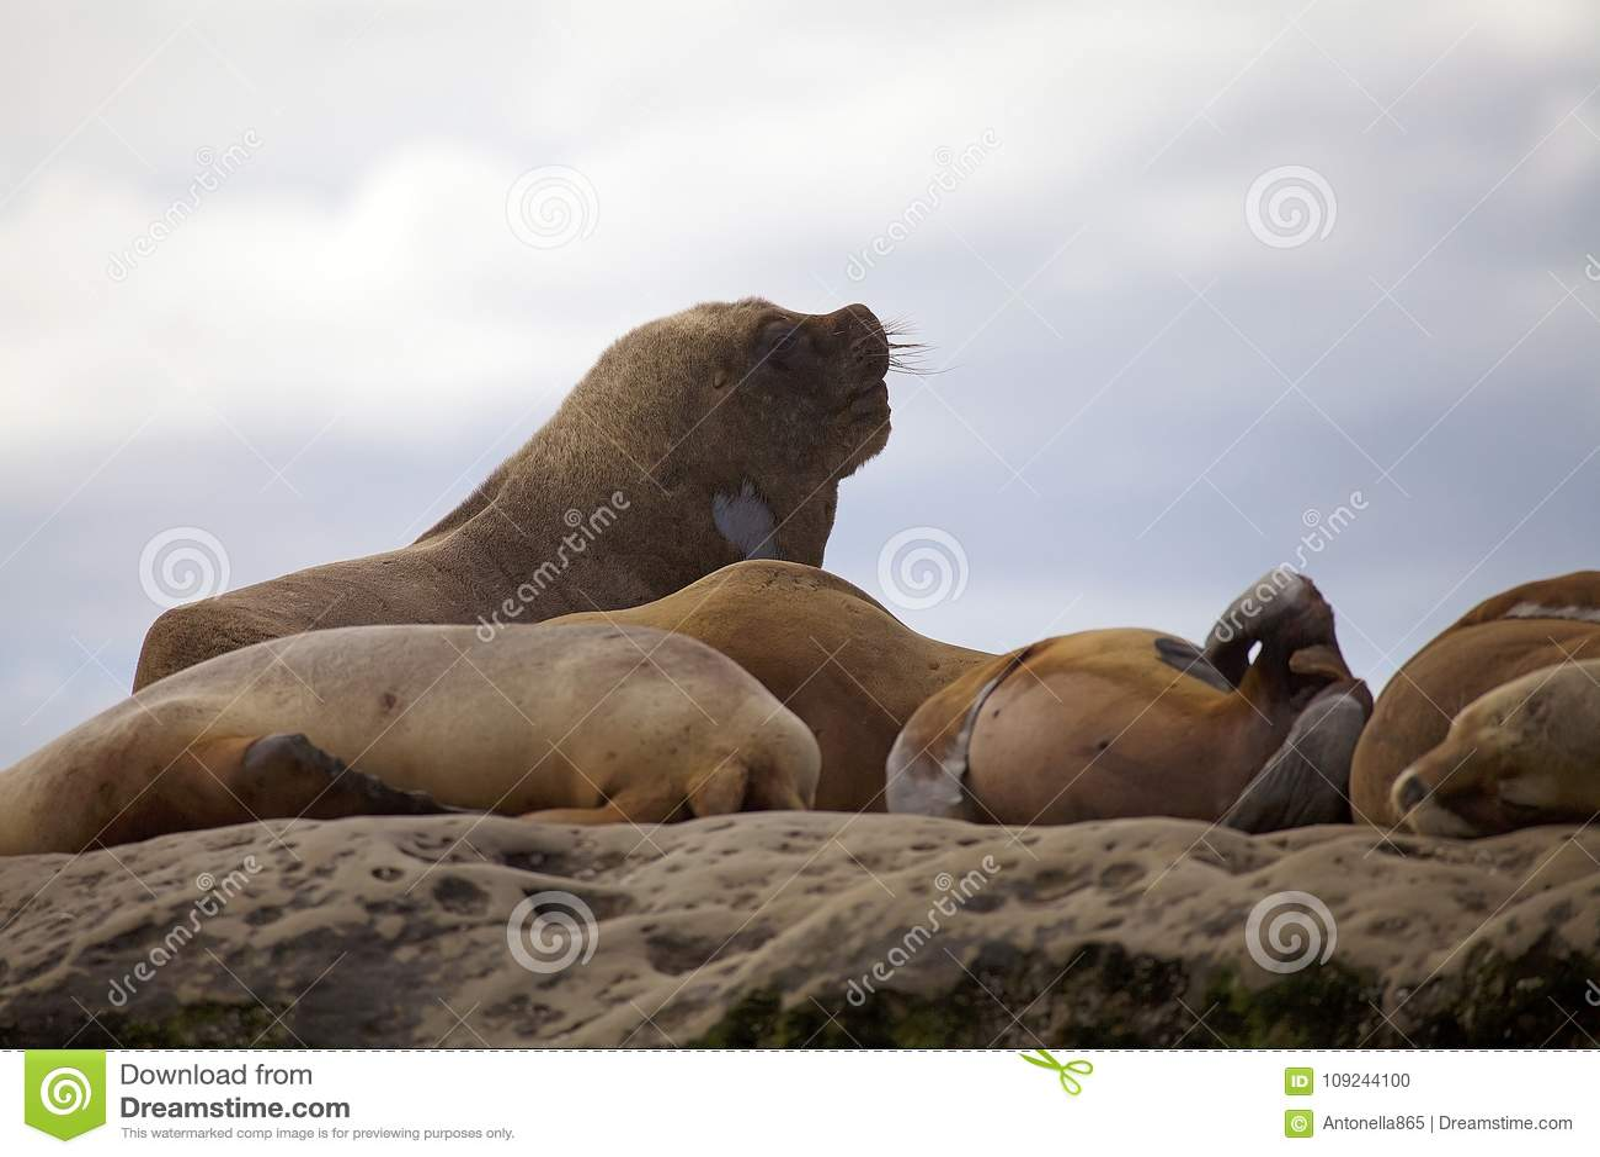 Sea Lions on the rock in the Valdes Peninsula, Atlantic Ocean, Argentina